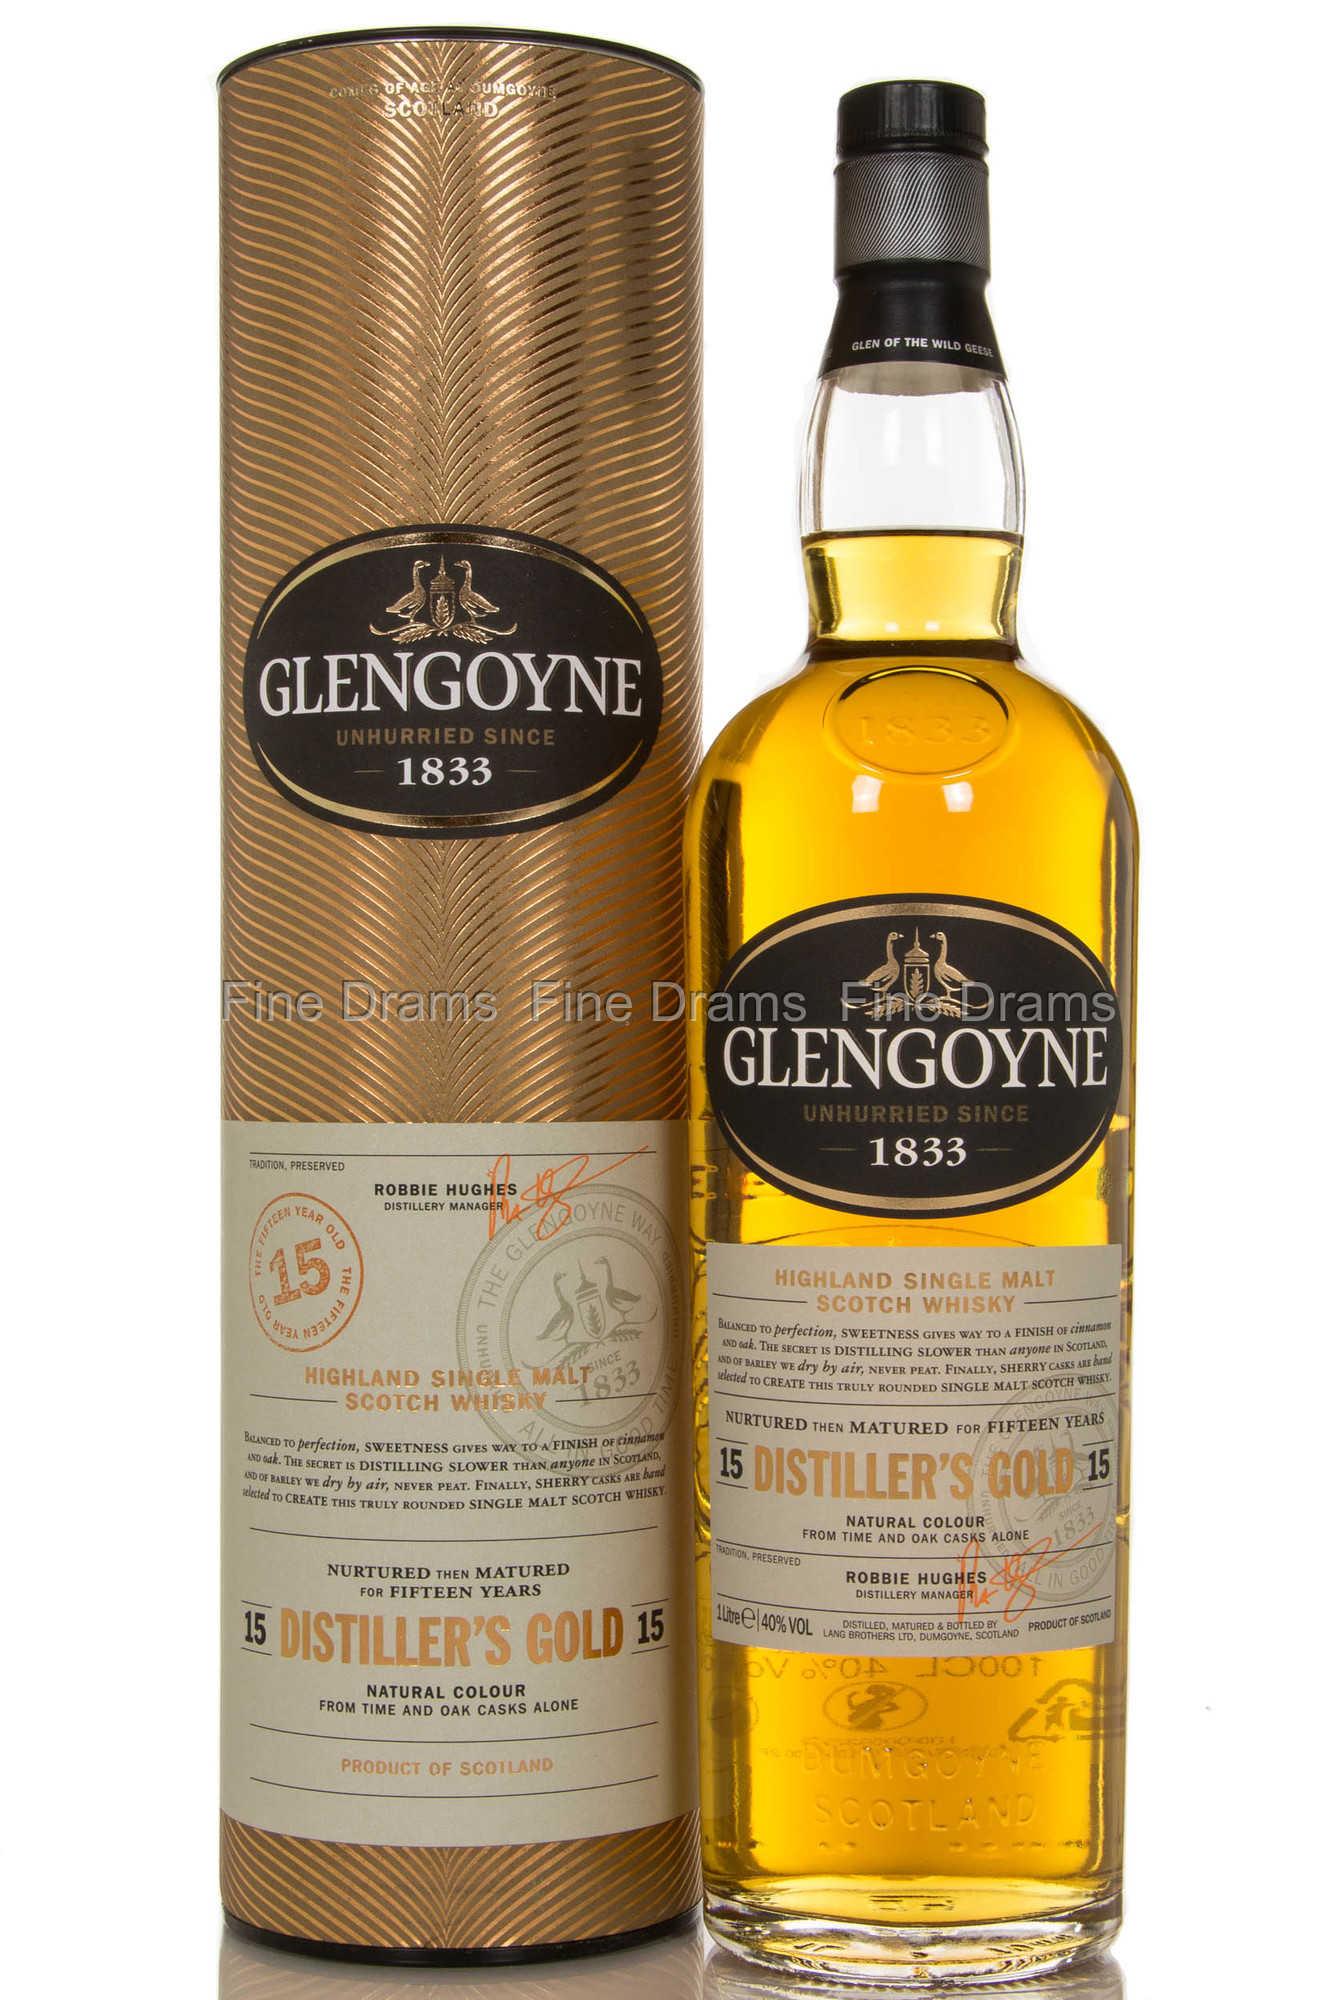 Glengoyne 15 Year Old Distiller's Gold 1 Liter Scotch Whisky